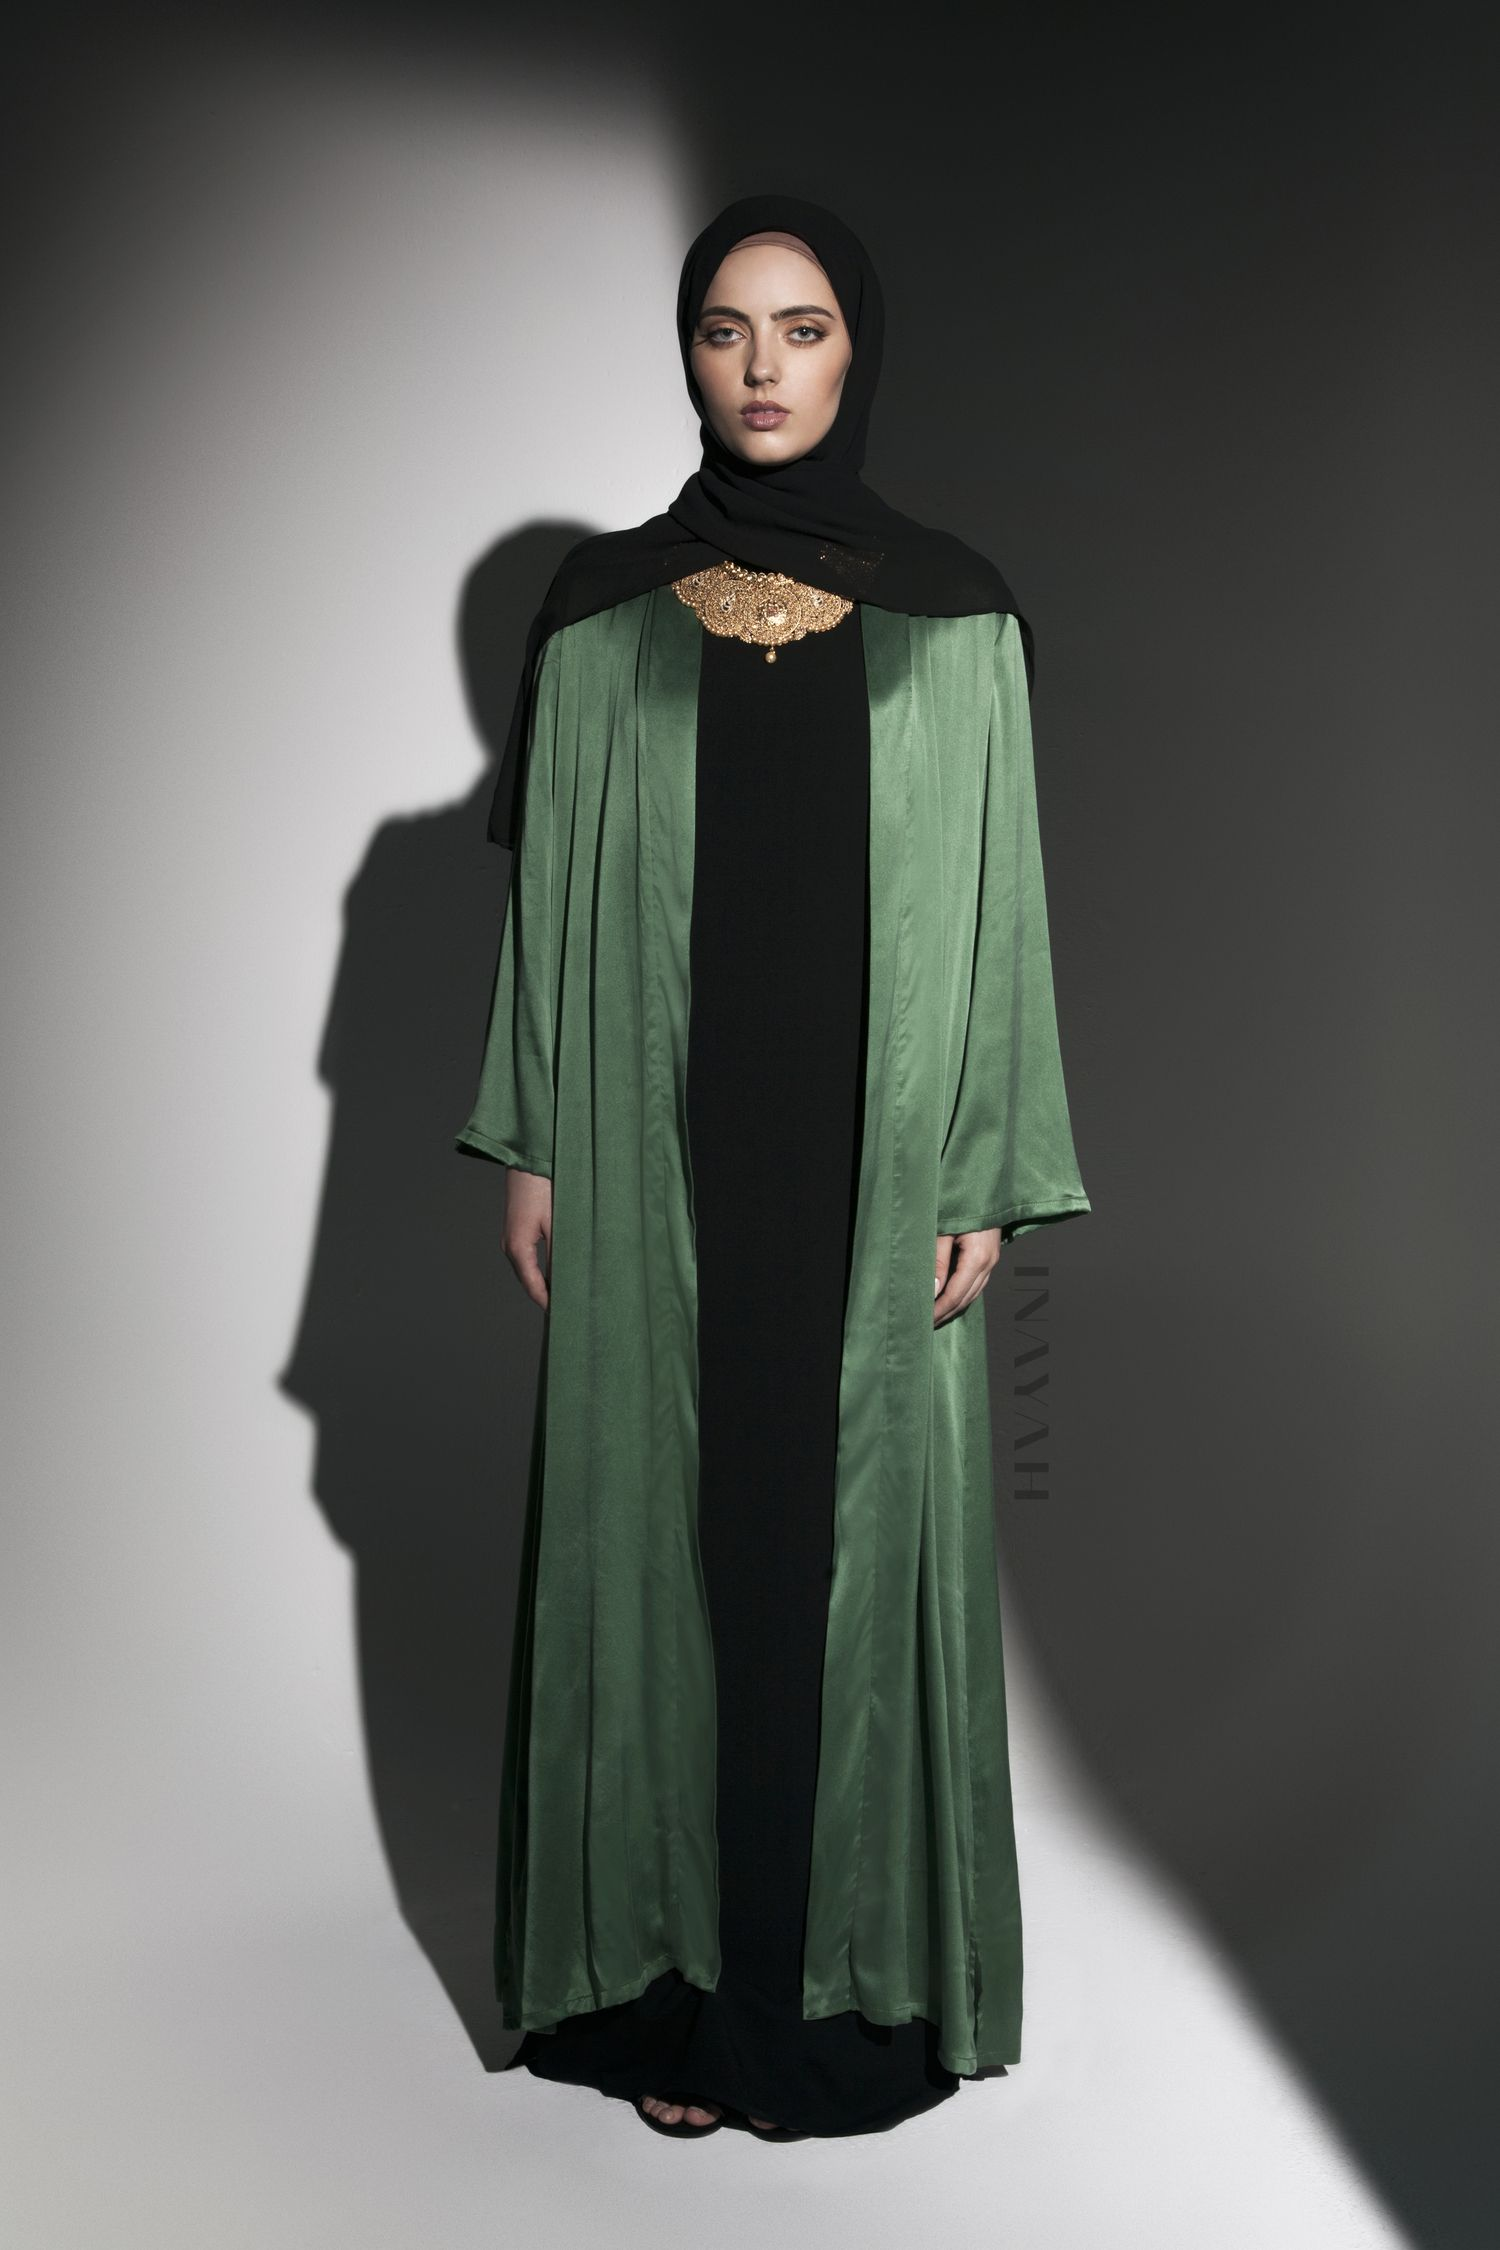 Aaliya Collections: Islamic Clothing, Abayas, Hijabs